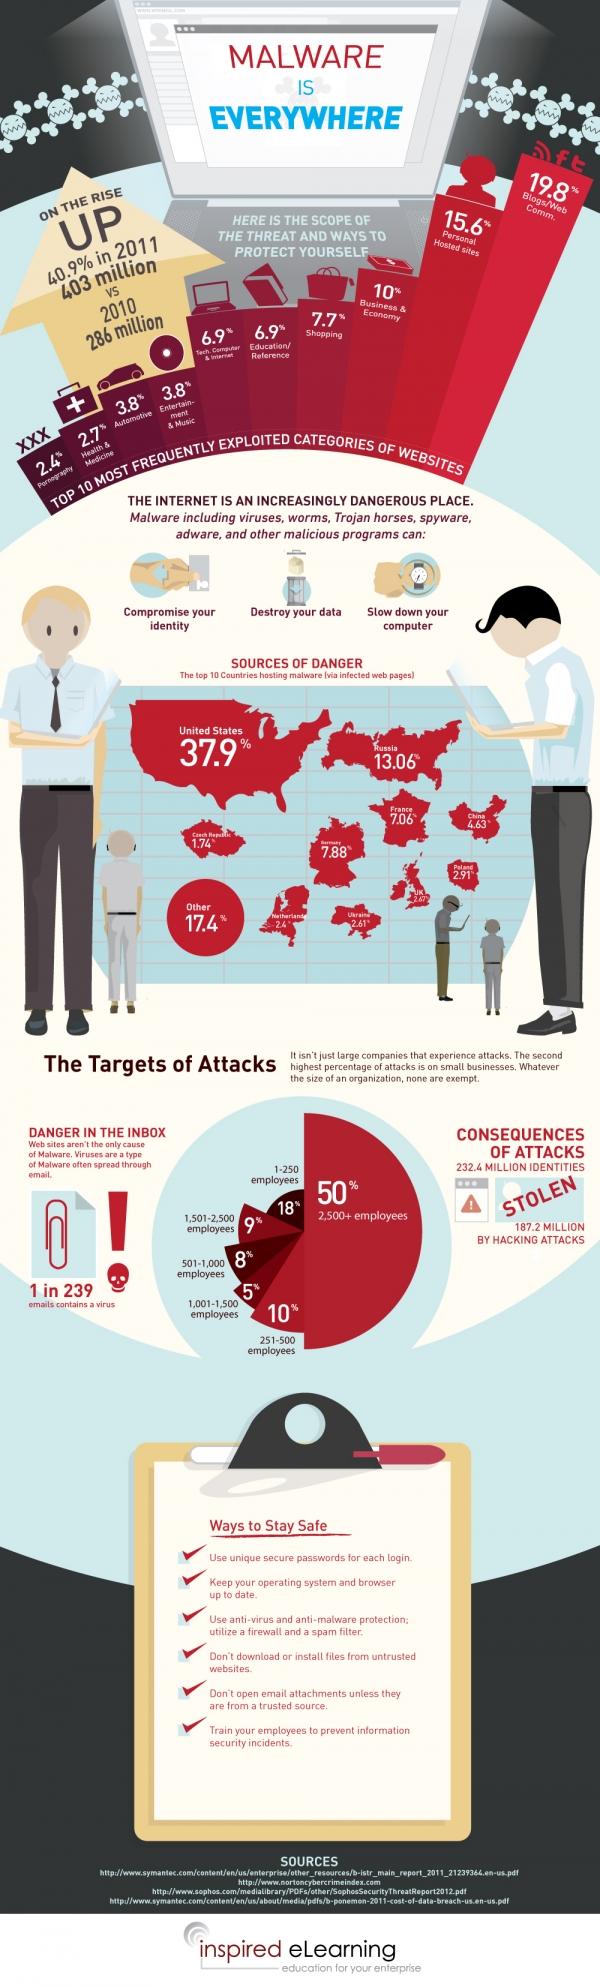 malware is everywhere